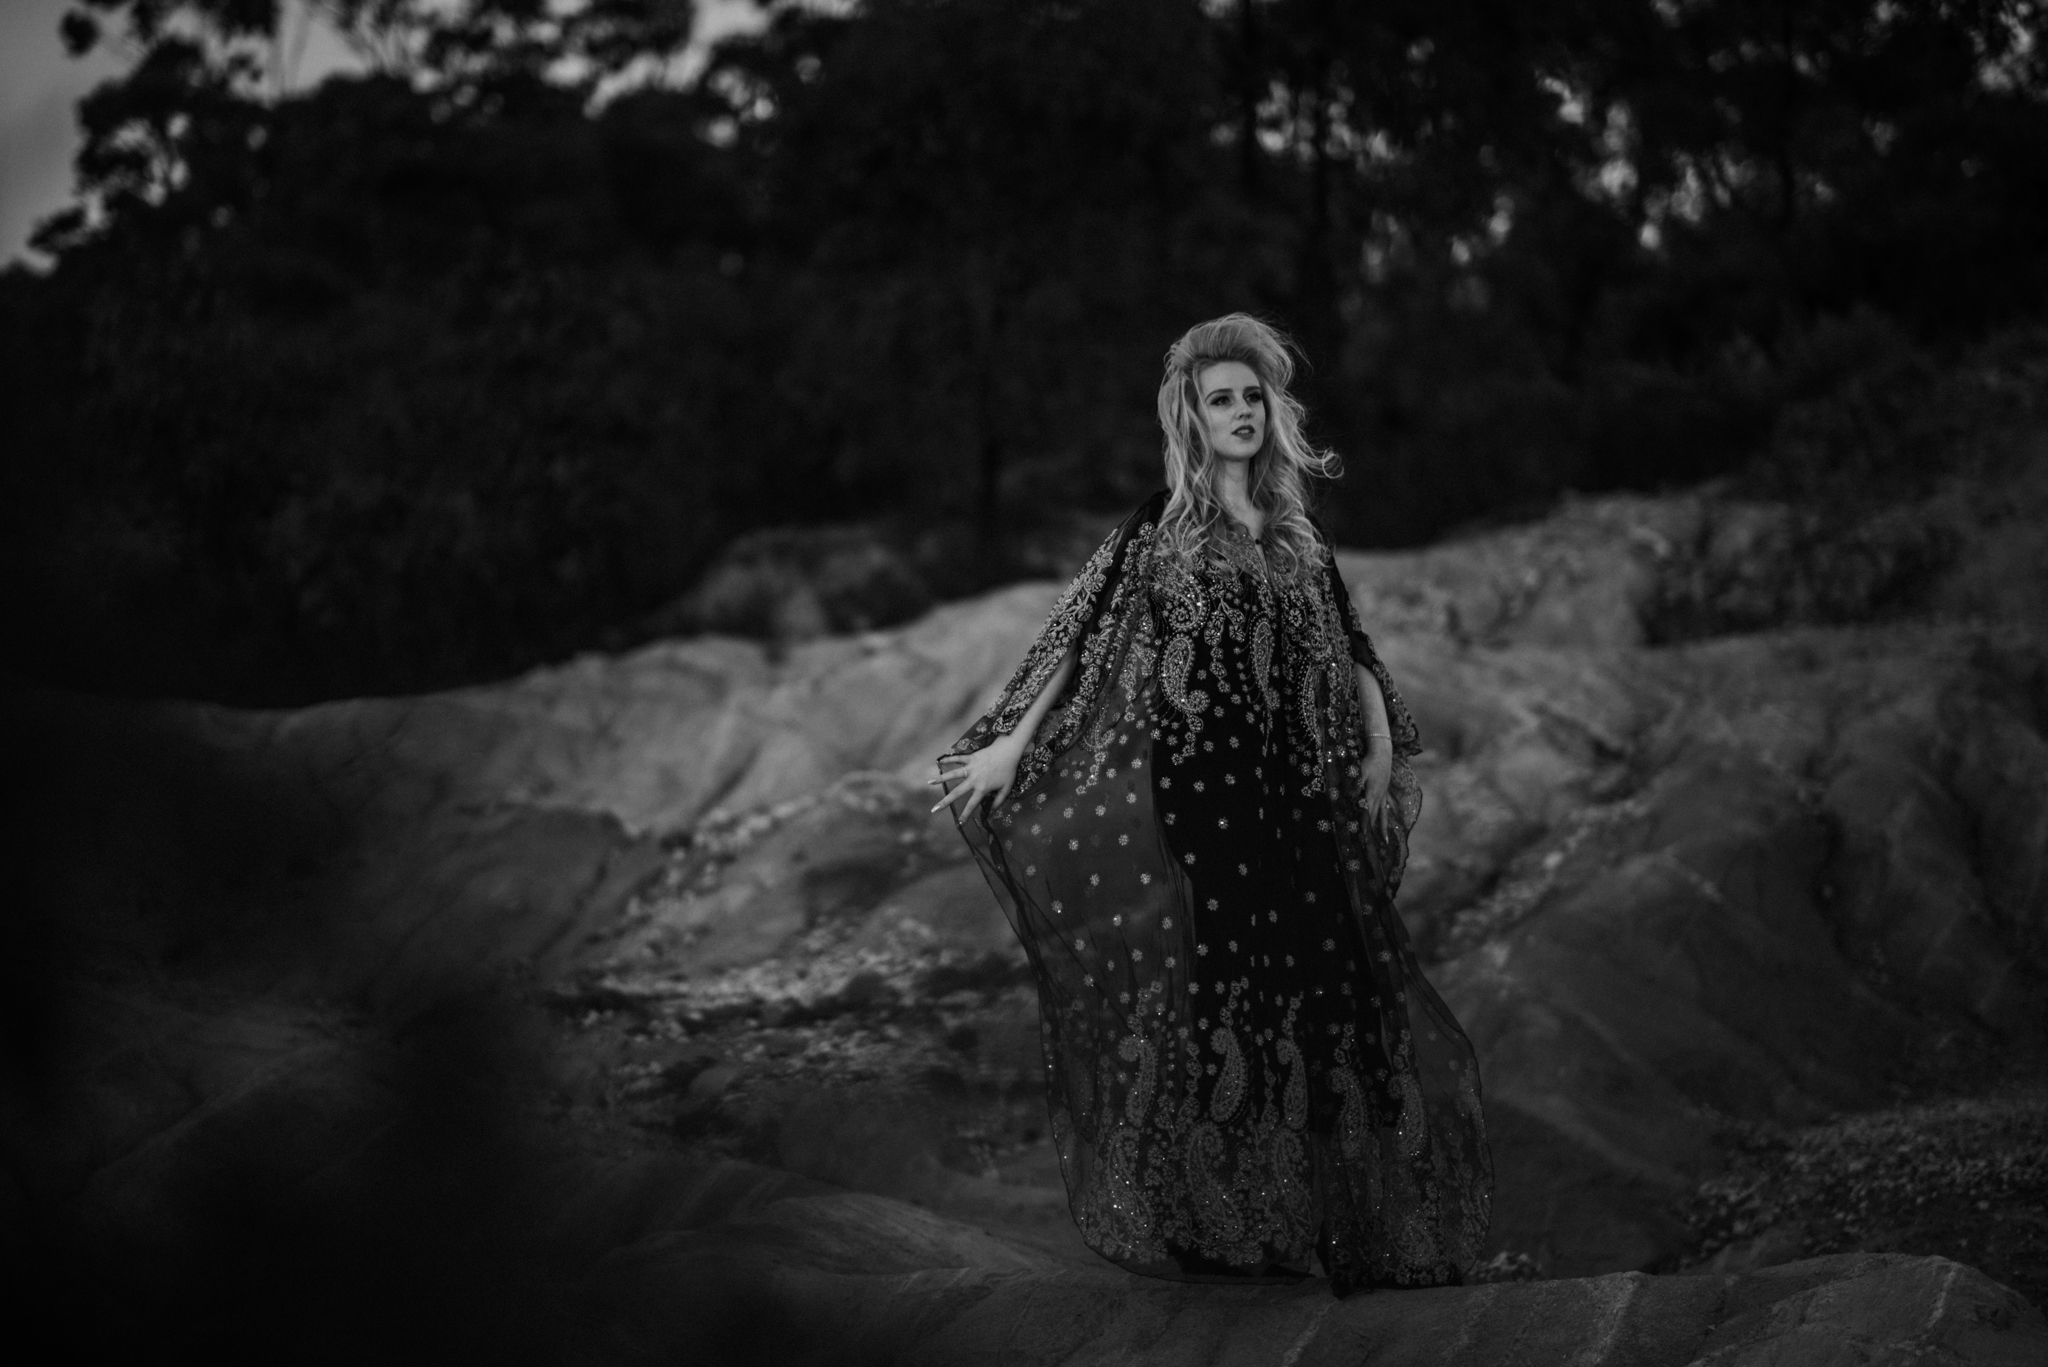 LOVELENSCAPES PHOTOGRAPHY • VISUAL POETRY • MELBOURNE WEDDING PHOTOGRAPHER • ALANNAH HILL DRESS • SUNSET ENGAGEMENT PHOTOS • PINK CLIFFS HEATHCOTE • FASHION EDITORIAL PHOTOGRAPHER • 30.jpg